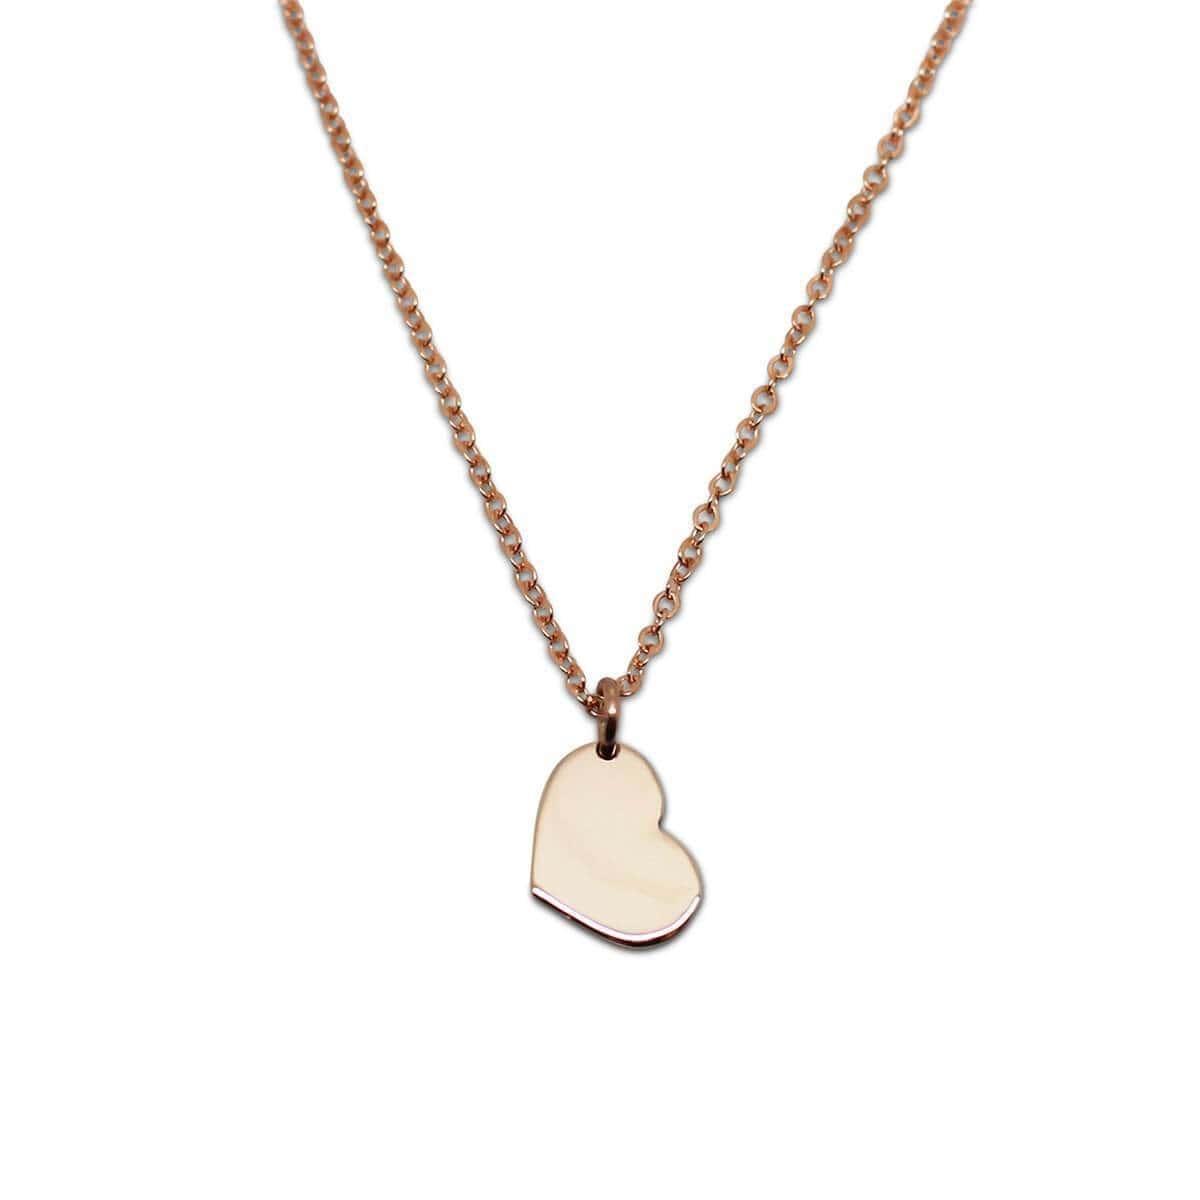 9kt Yellow Gold Little Heart Necklace